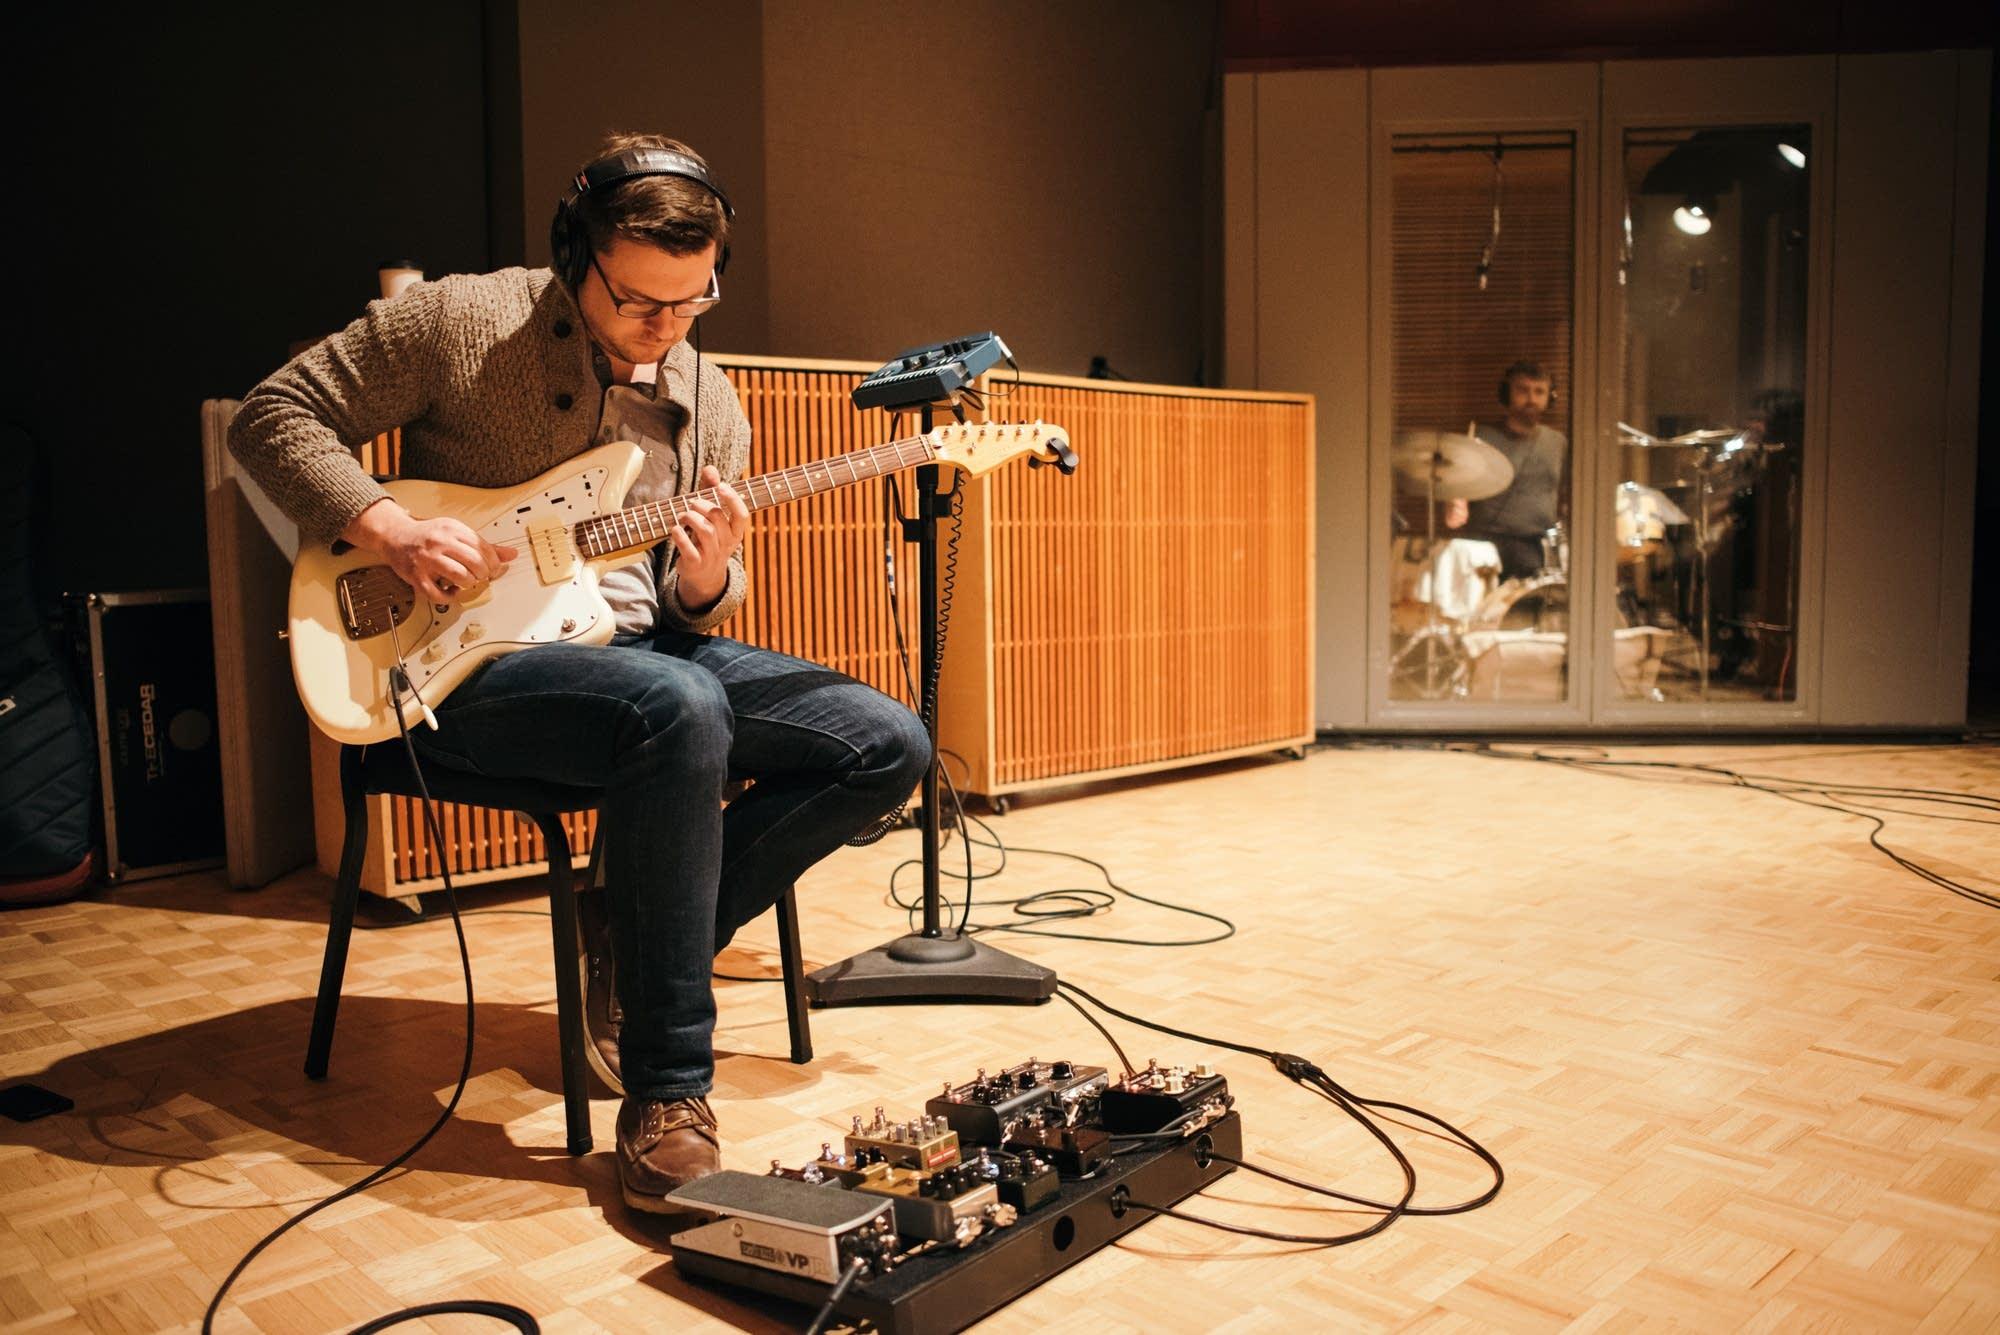 Robert Mulrennan performs in The Current studio